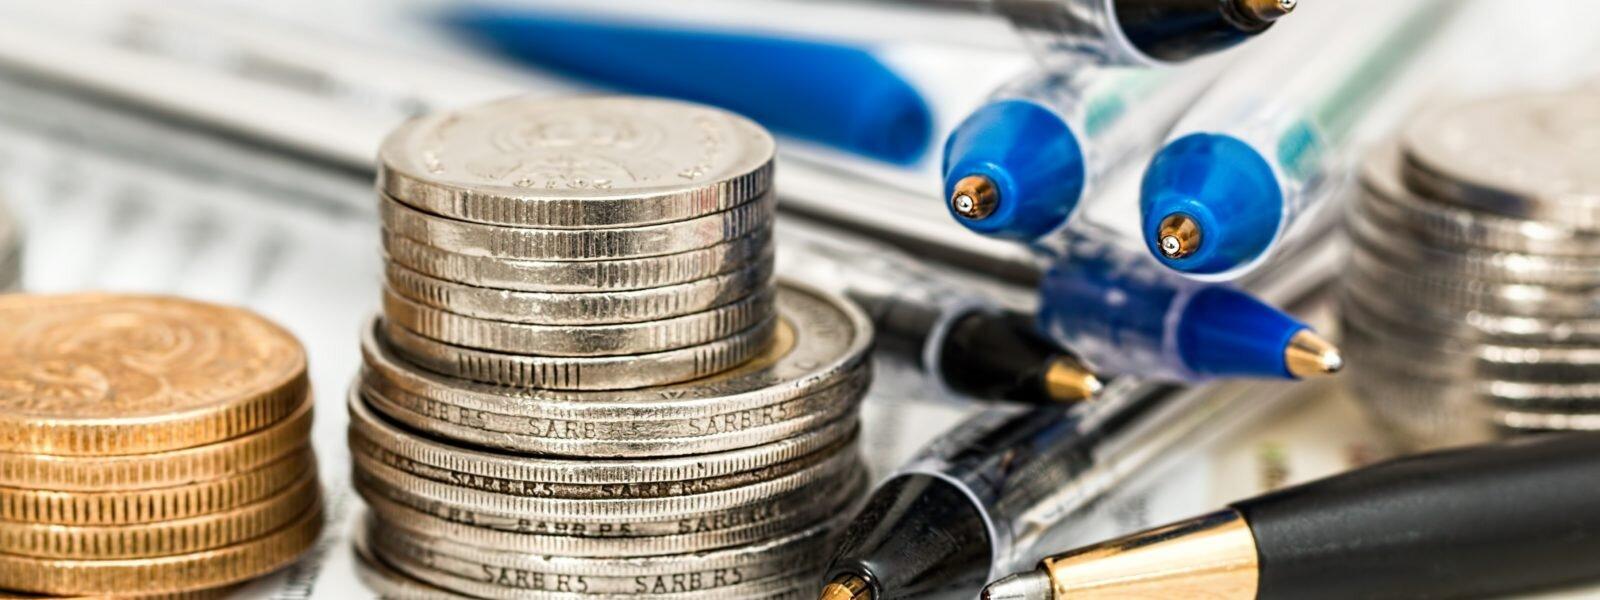 budget-cash-coins-33692-1600x600.jpg